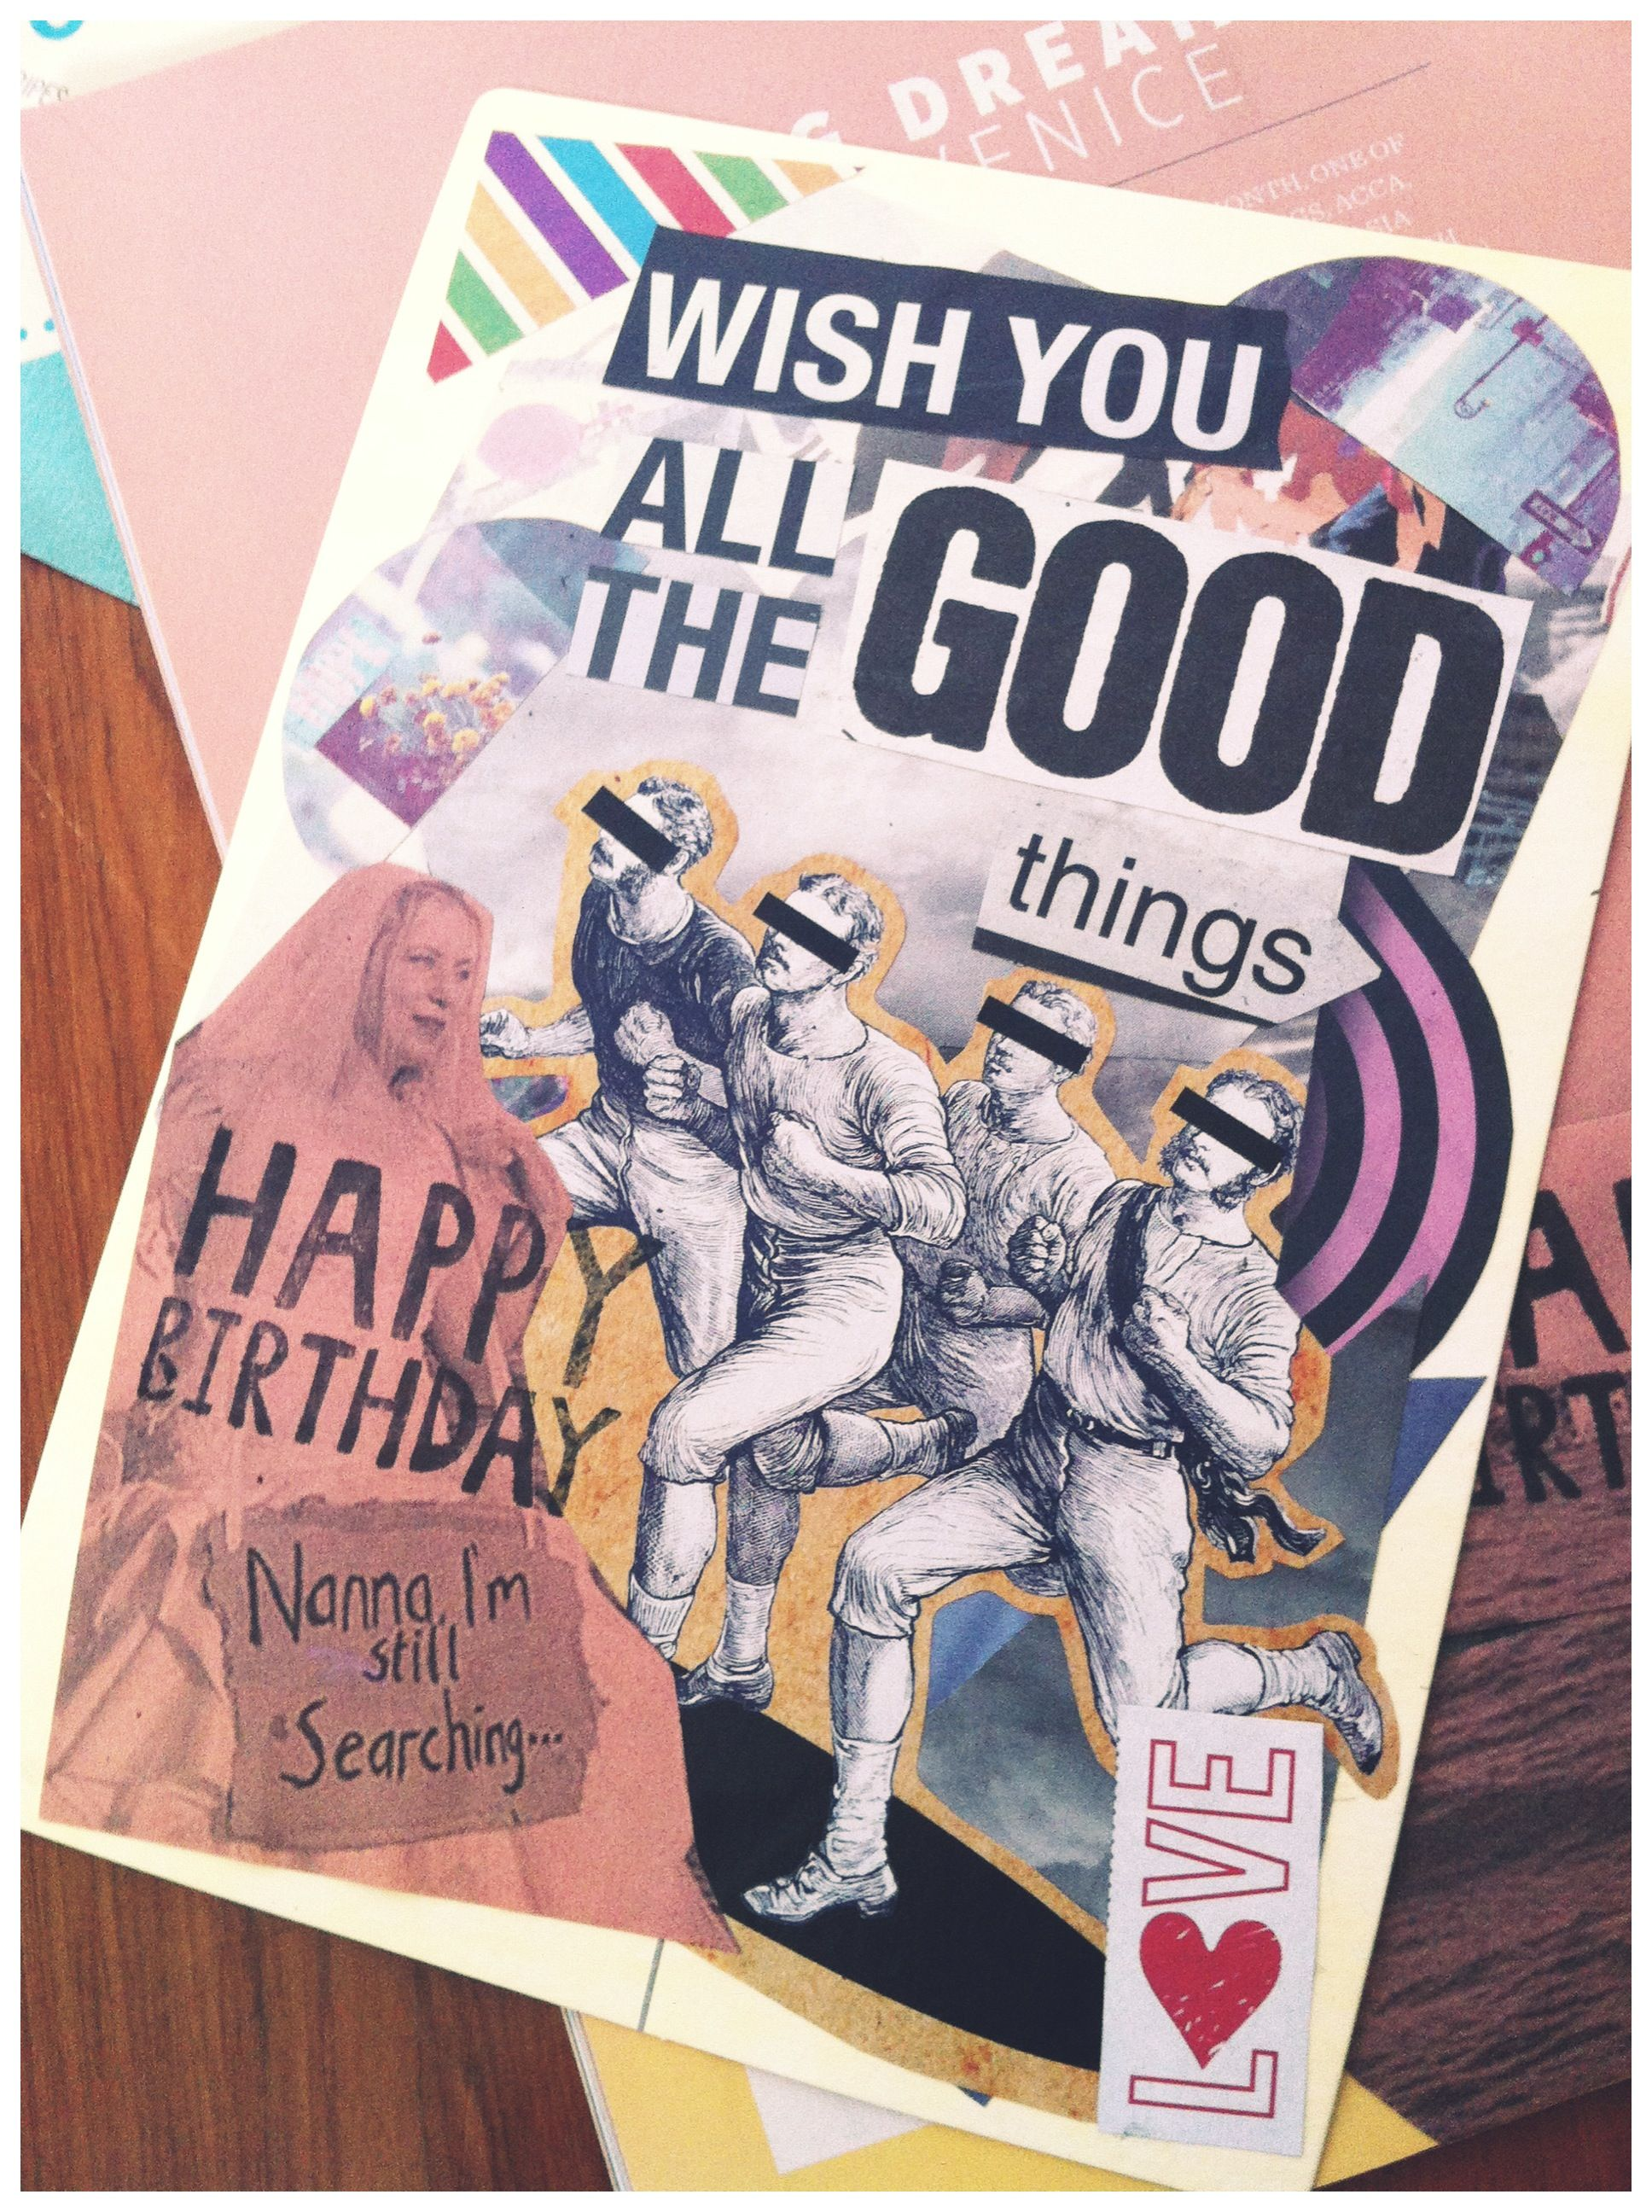 Diy birthday card collage diy pinterest diy birthday diy birthday card collage bookmarktalkfo Image collections